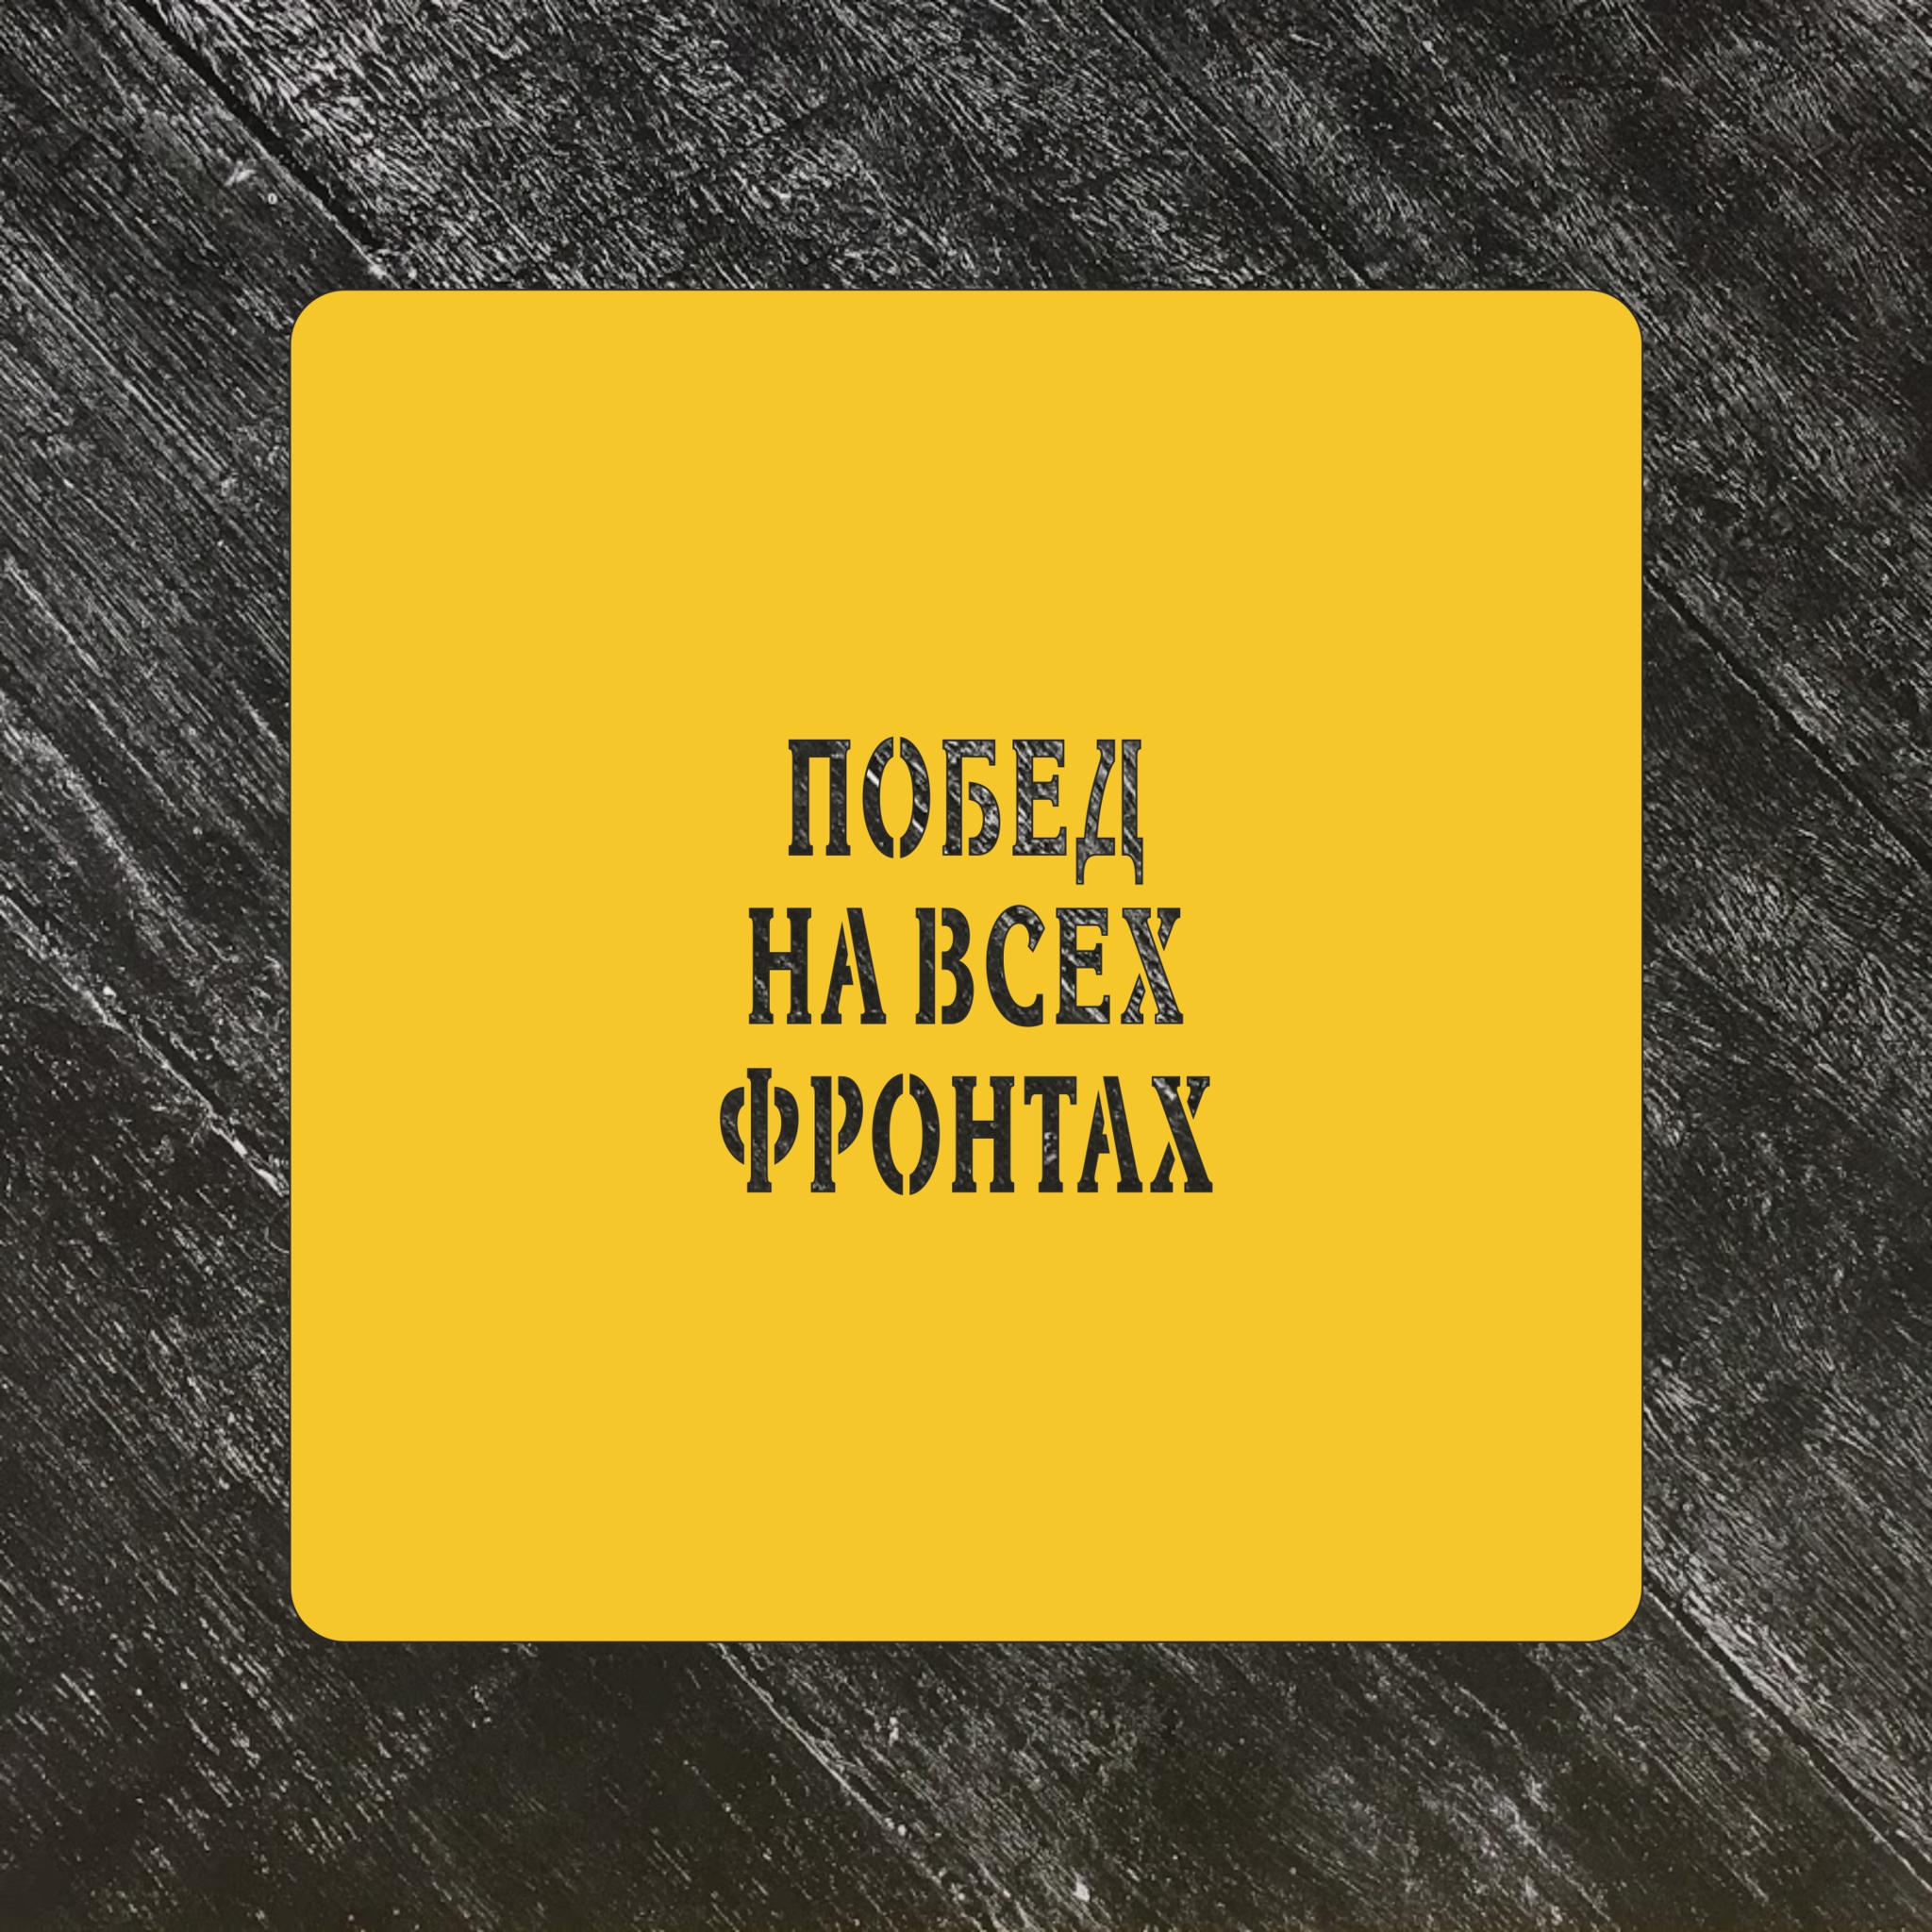 Трафарет 23 февраля №15 Побед на всех фронтах